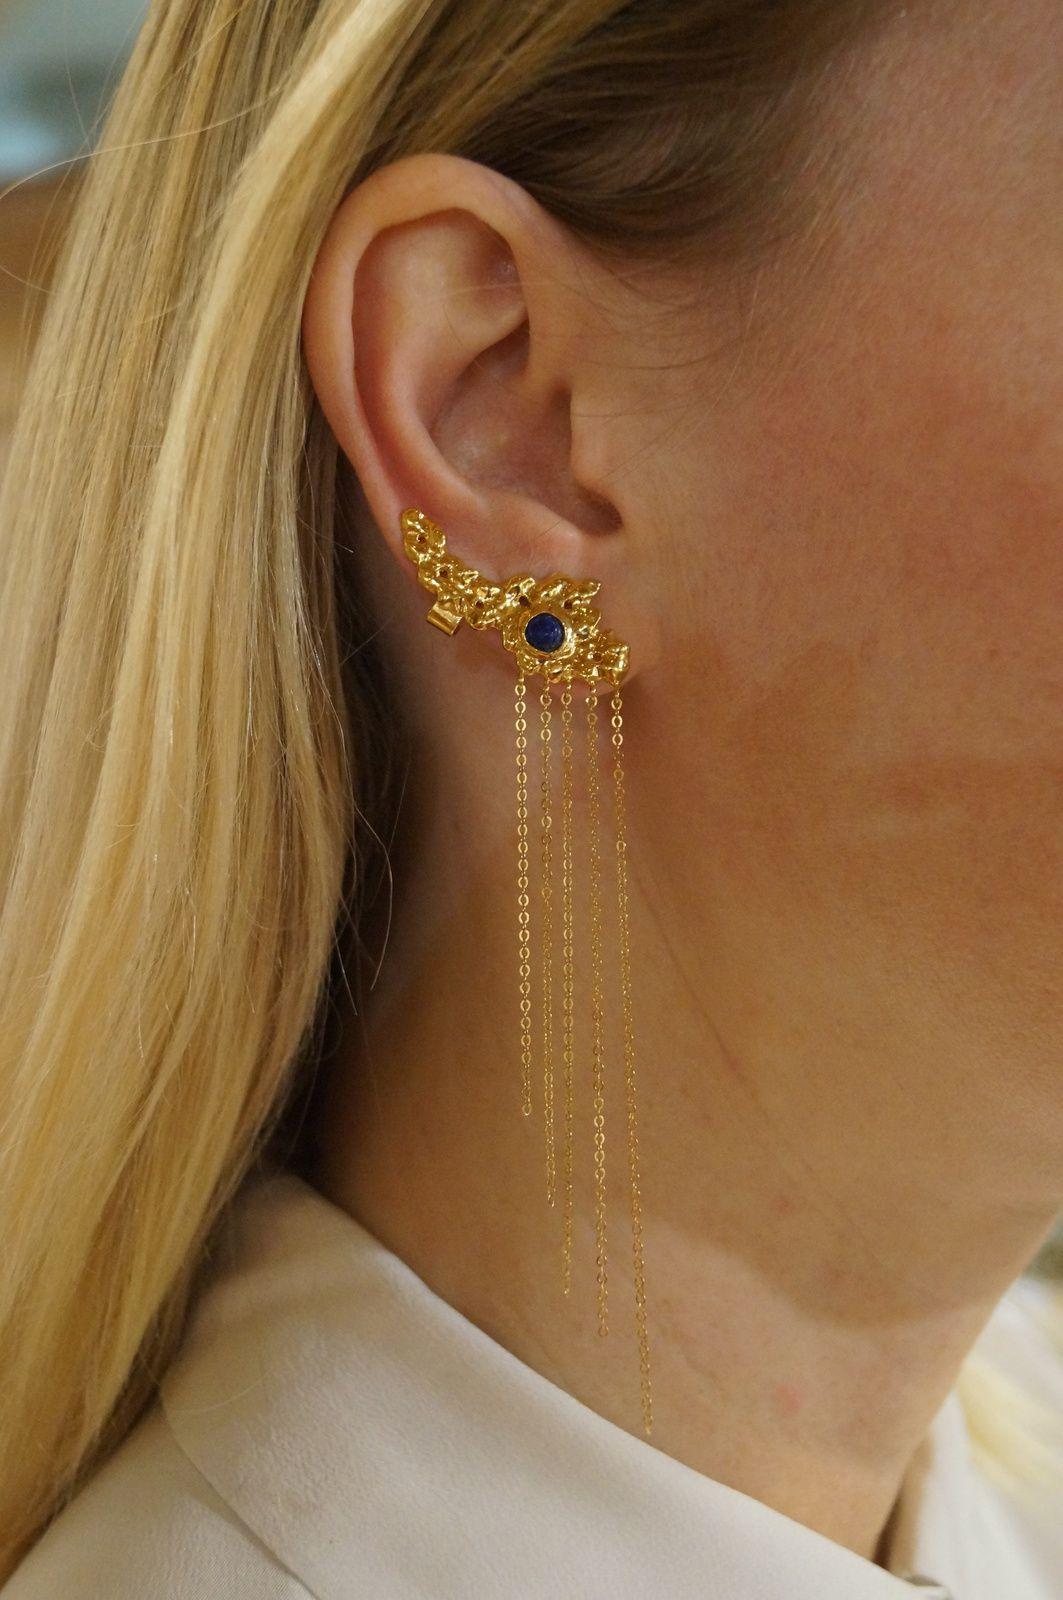 Boucle d'oreilles, collection ANCIENT   © BLISS FROM PARIS